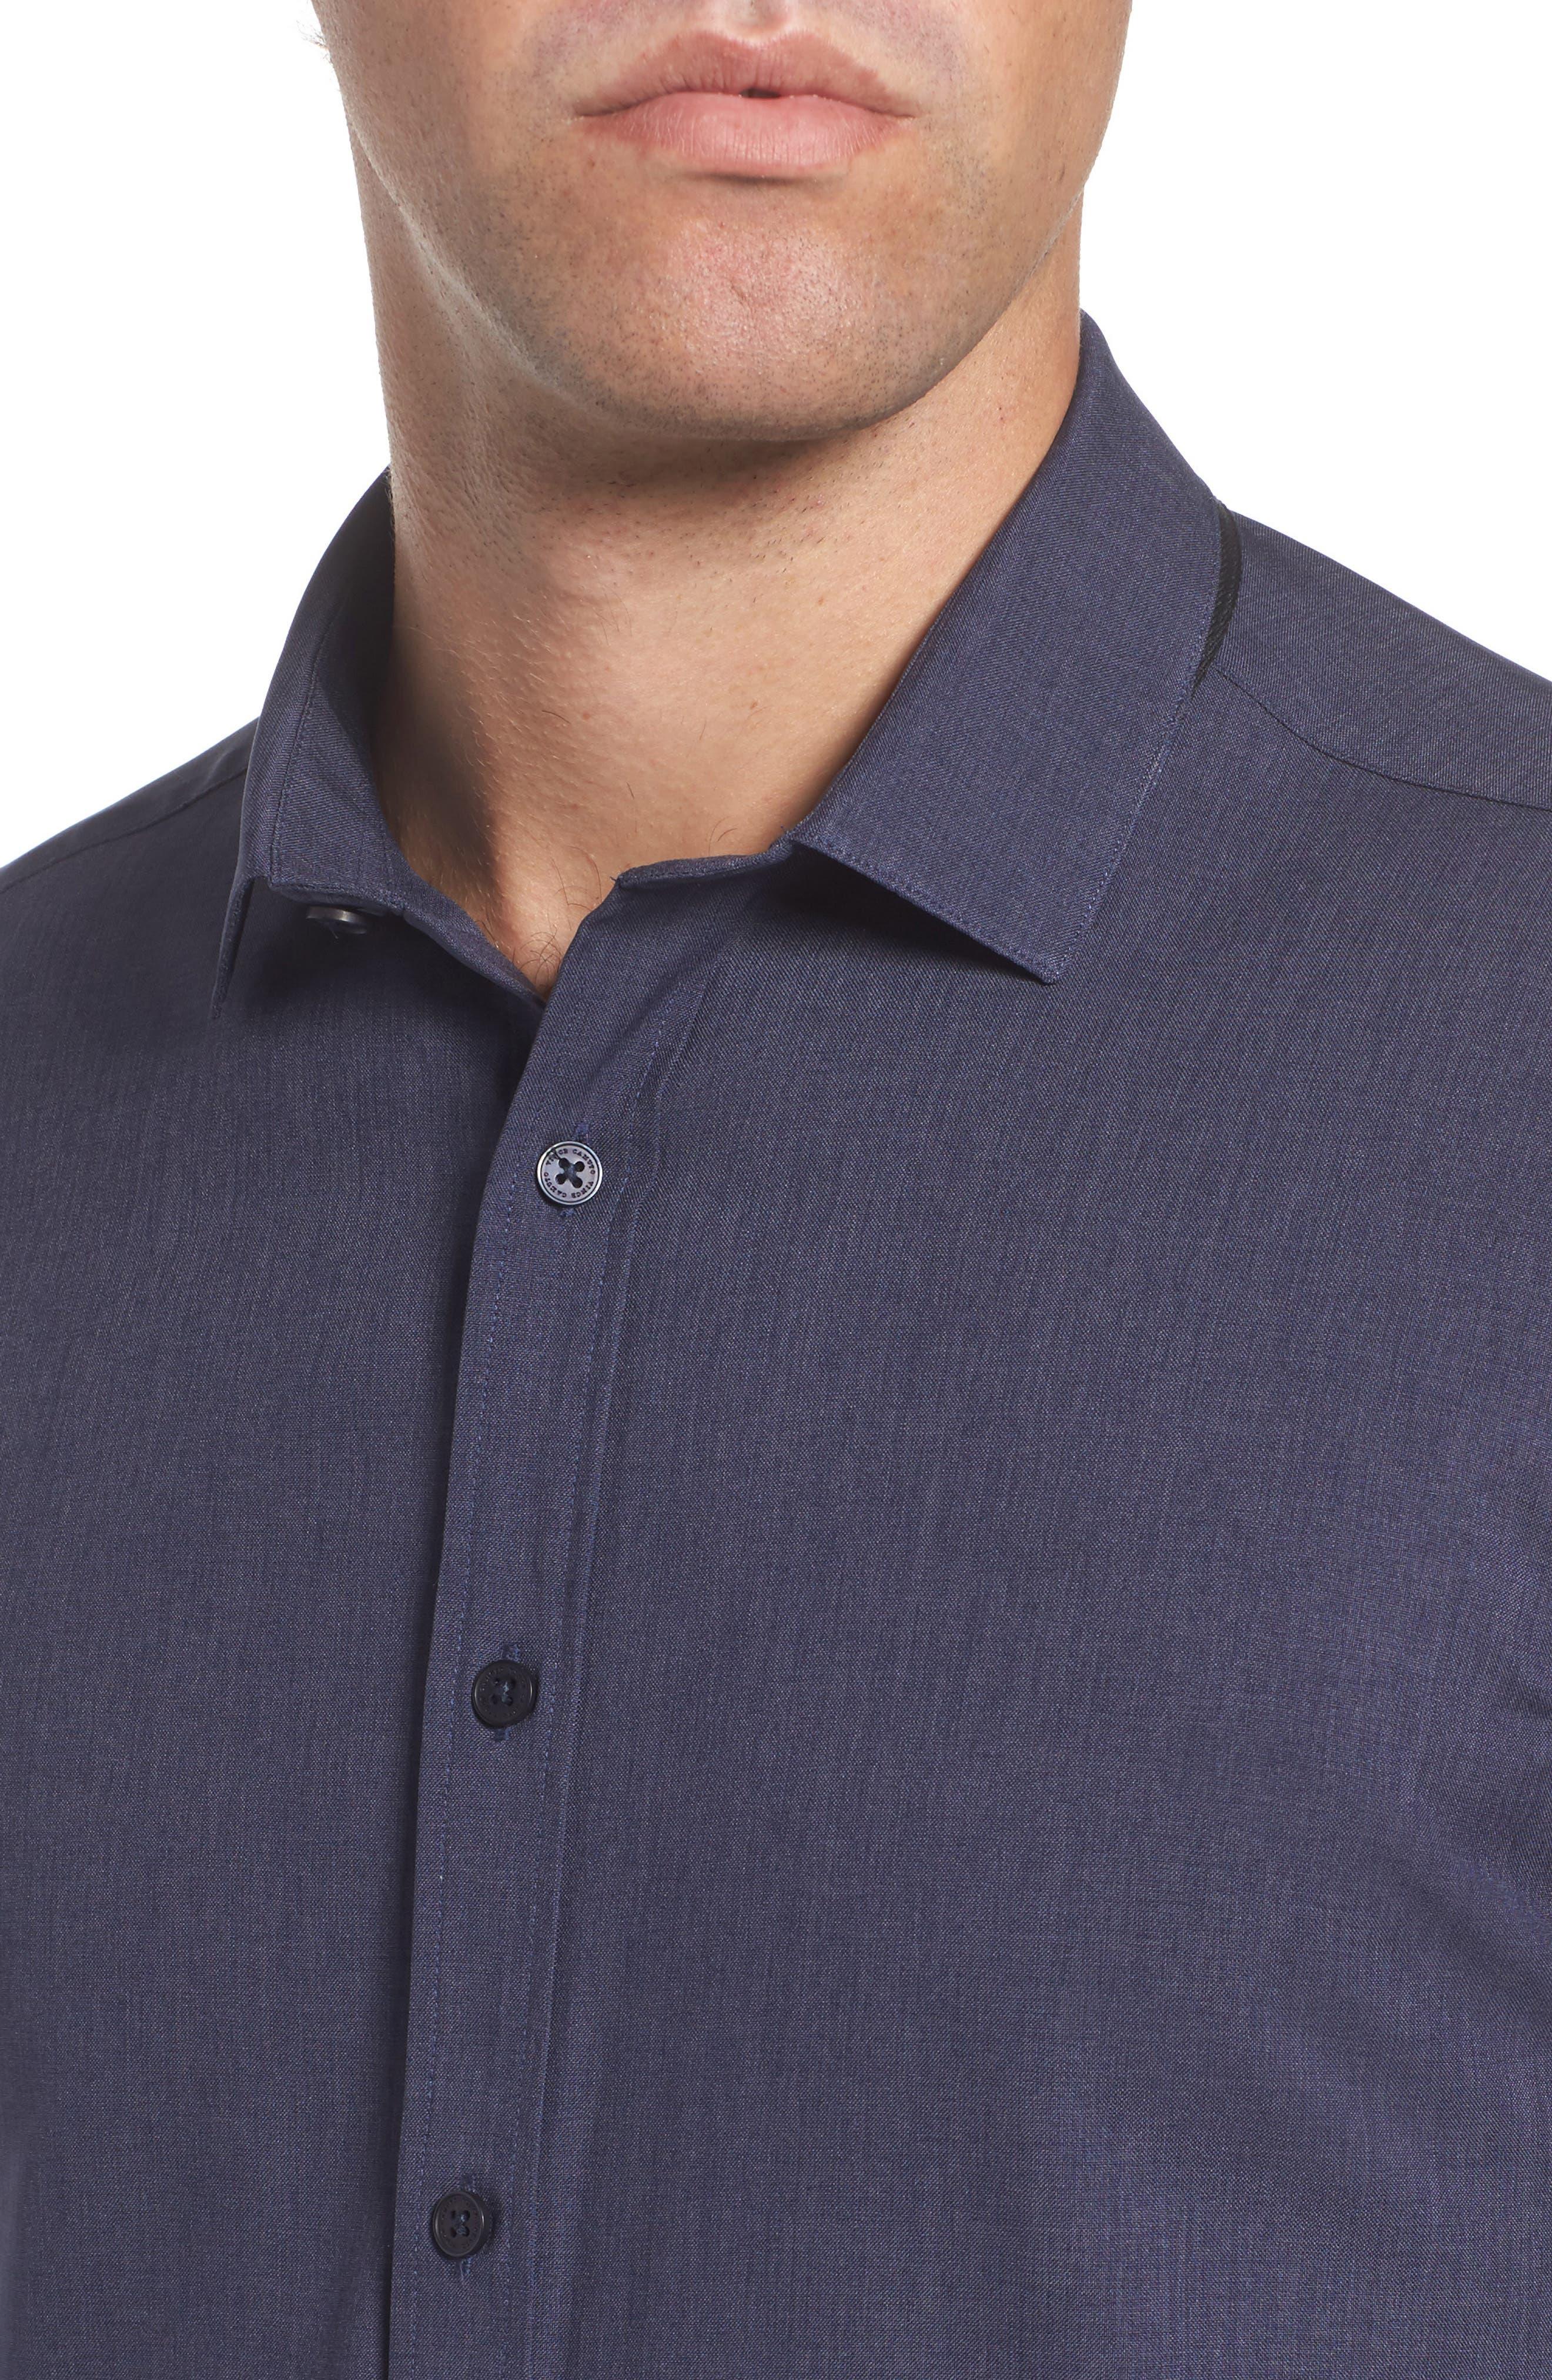 Trim Fit Performance Knit Sport Shirt,                             Alternate thumbnail 4, color,                             NAVY